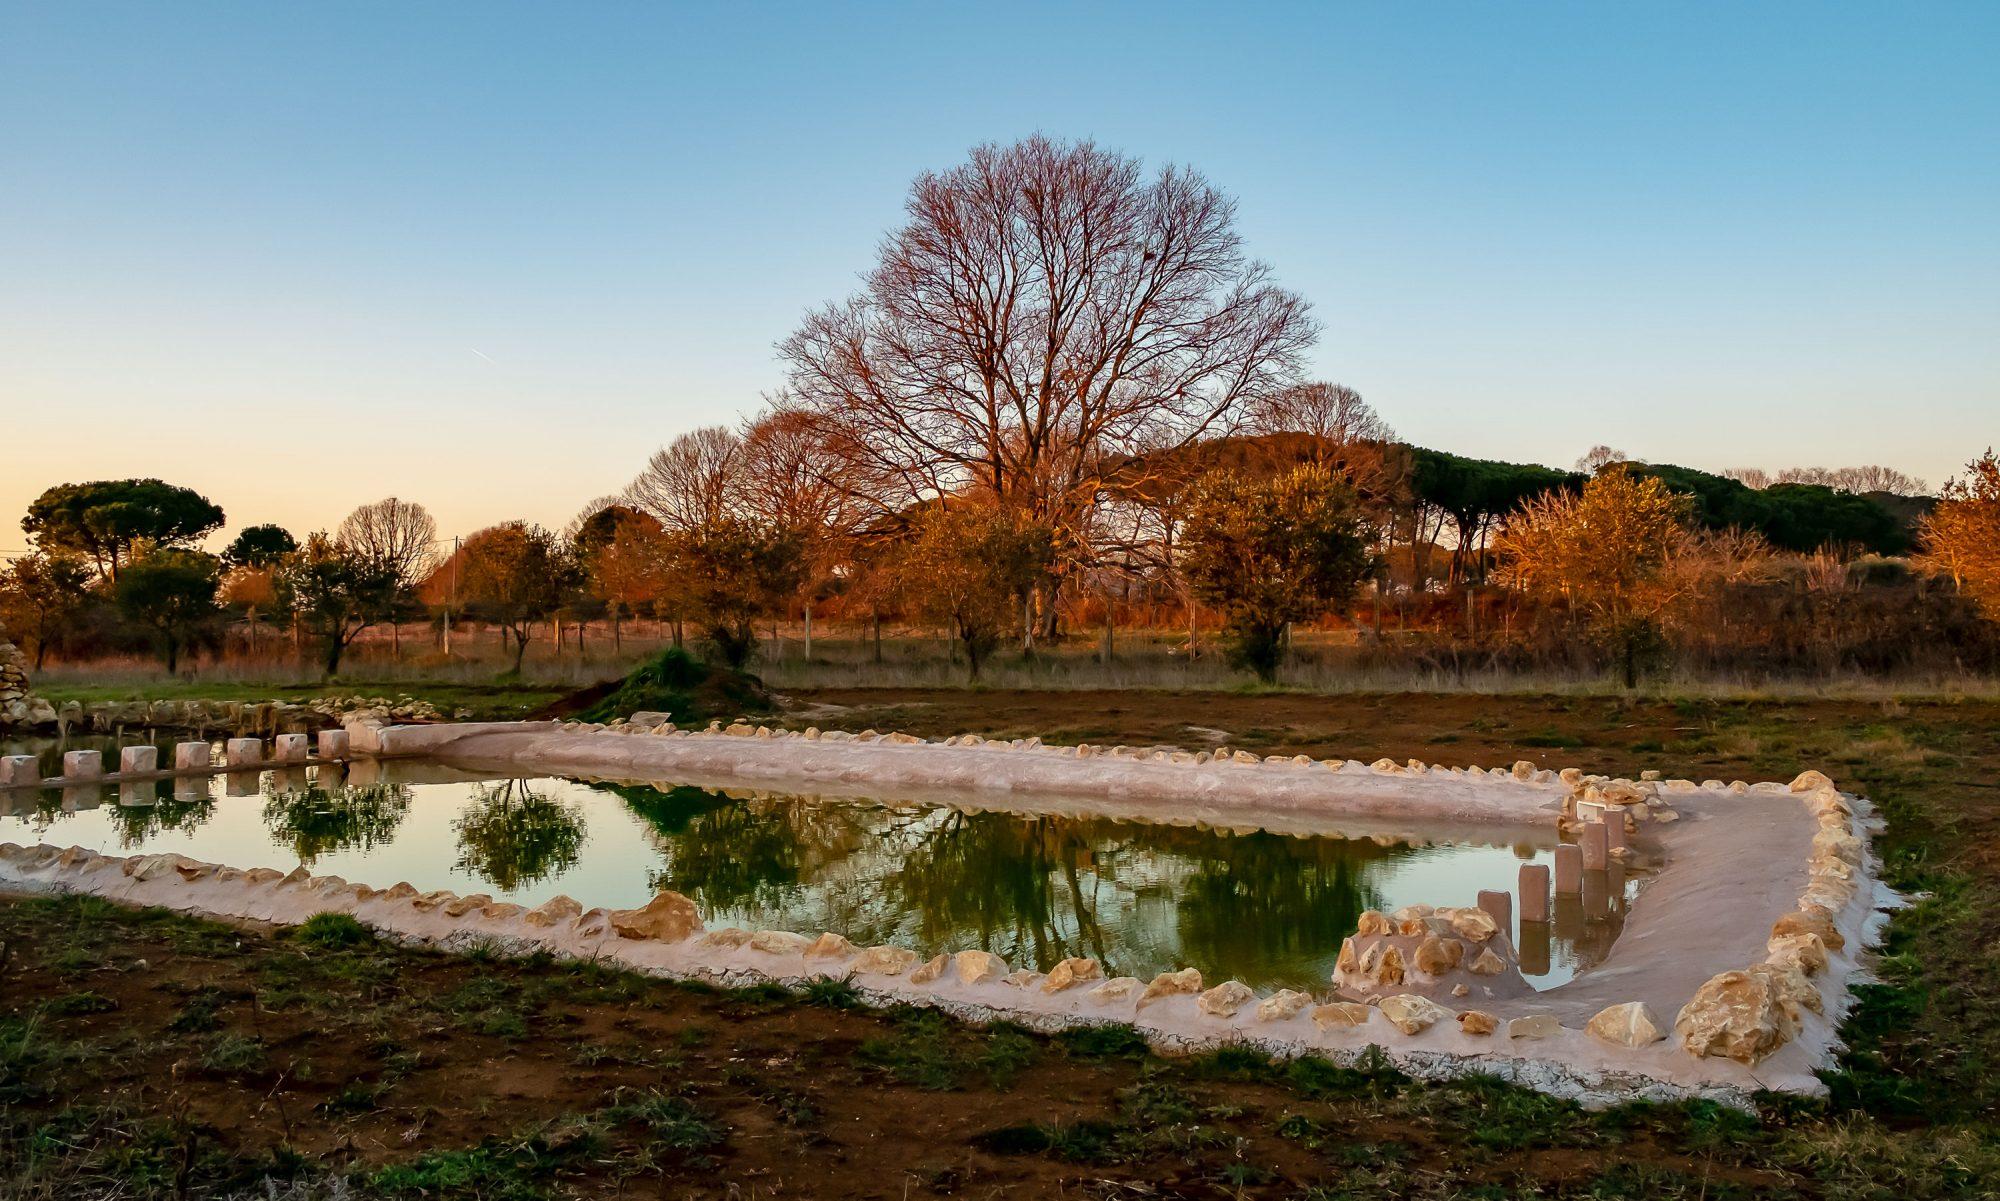 Il Giardino di Proserpina